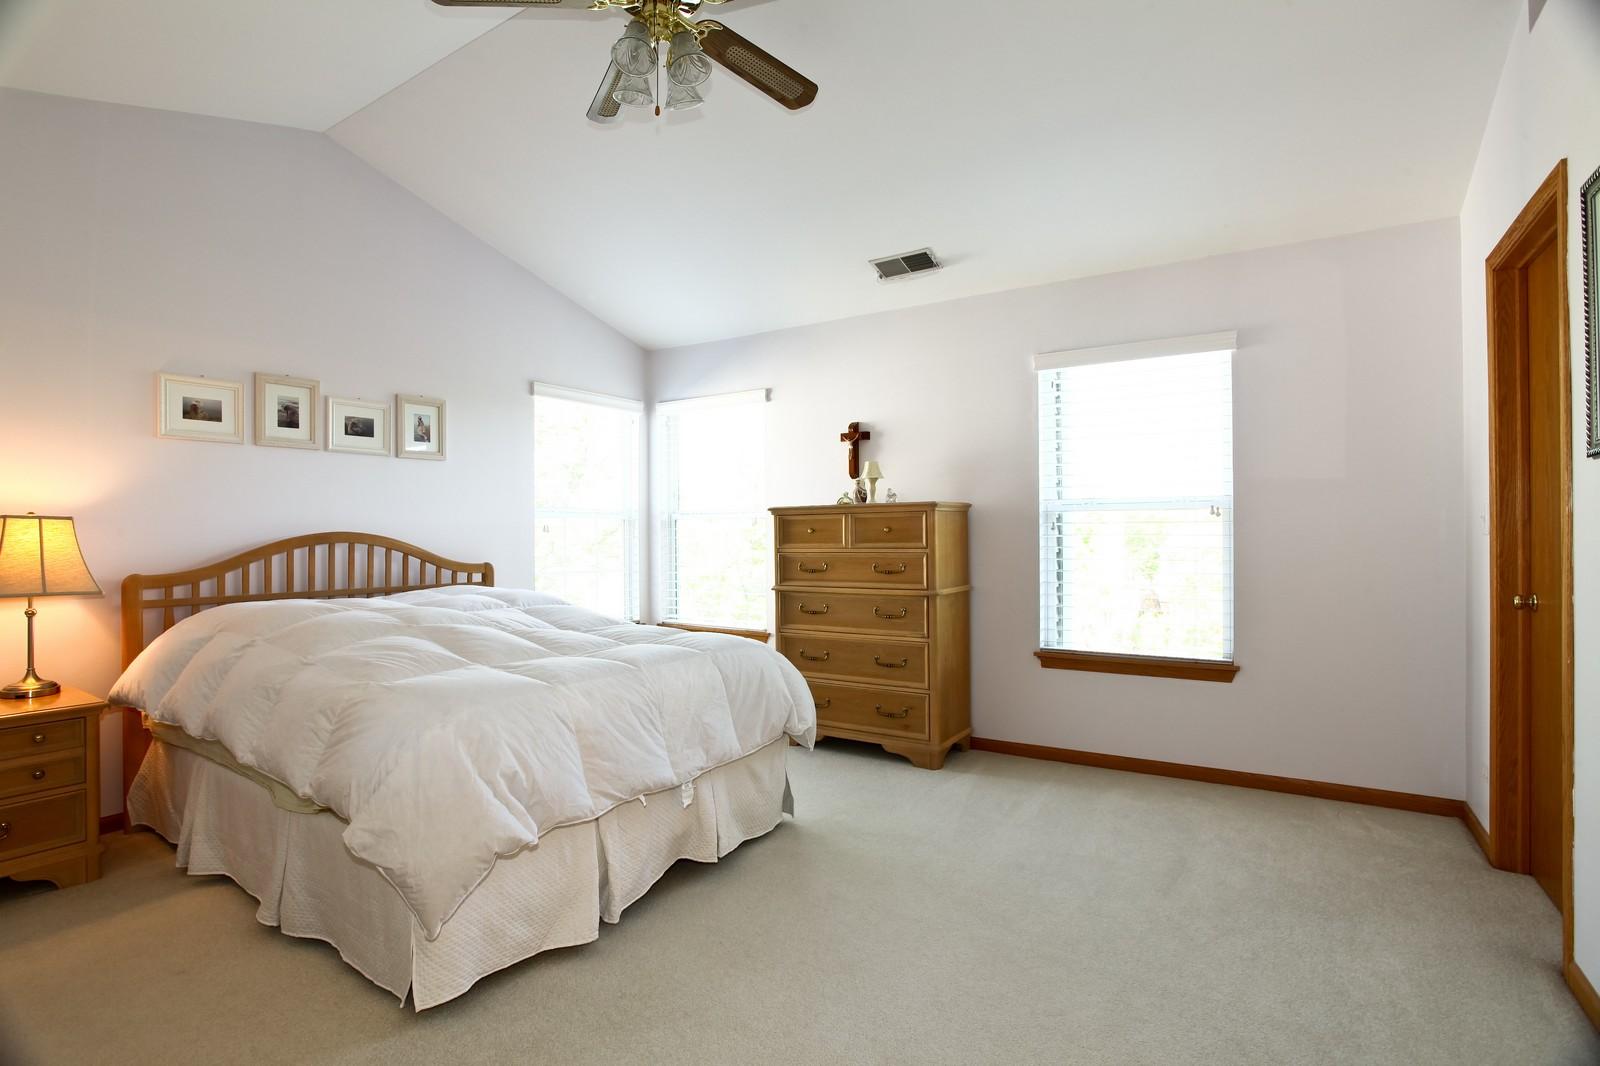 Real Estate Photography - 860 McKenzie Station Dr, Lisle, IL, 60532 - Master Bedroom